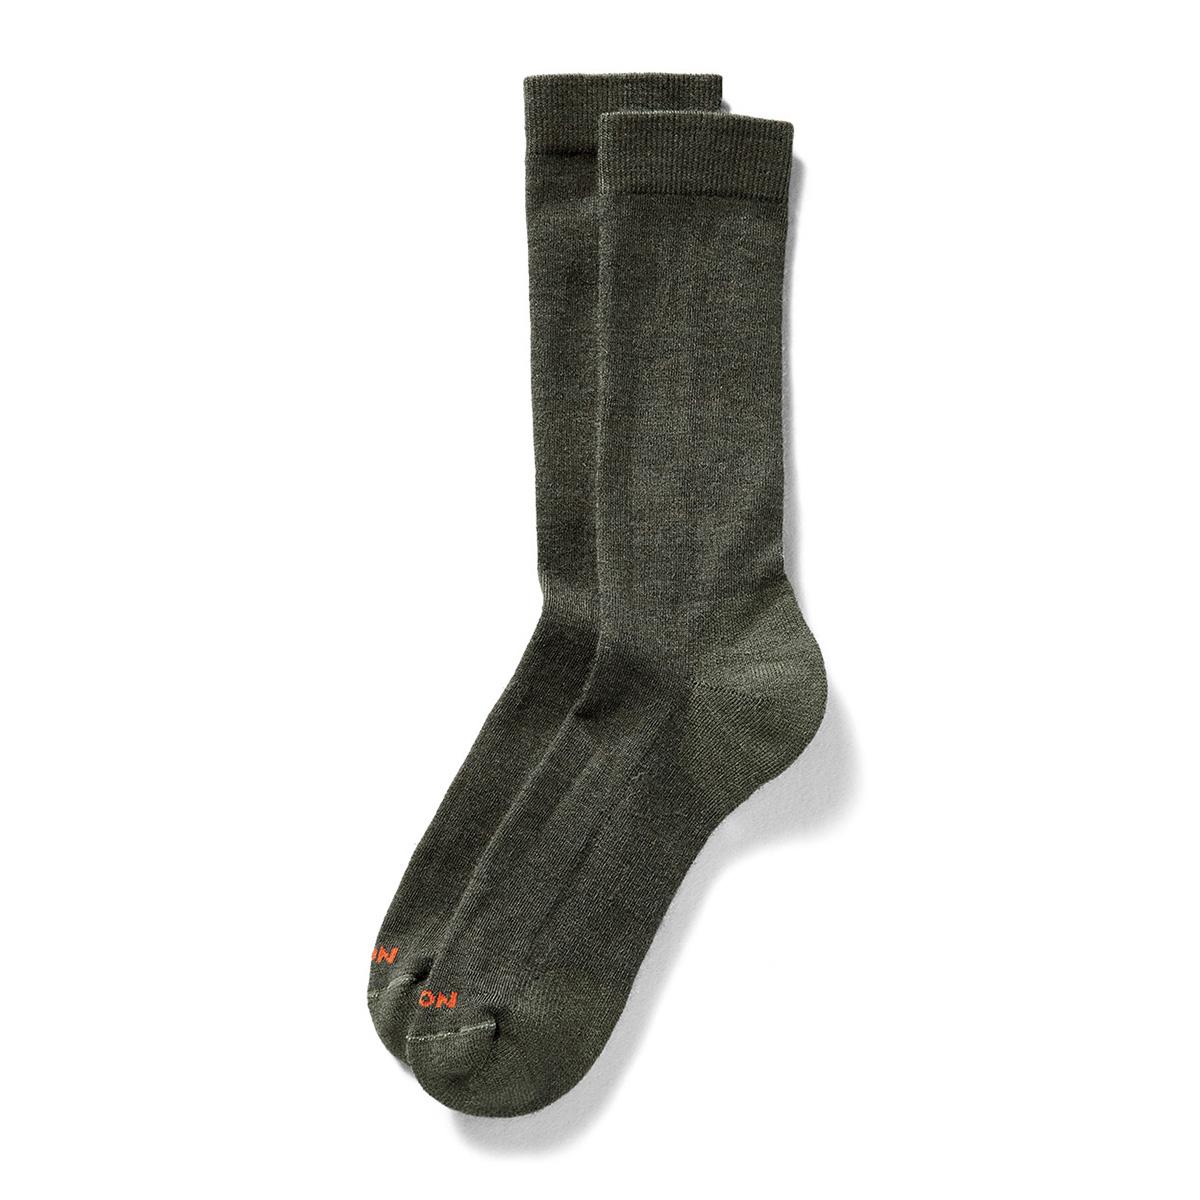 Filson Everyday Crew Sock Green